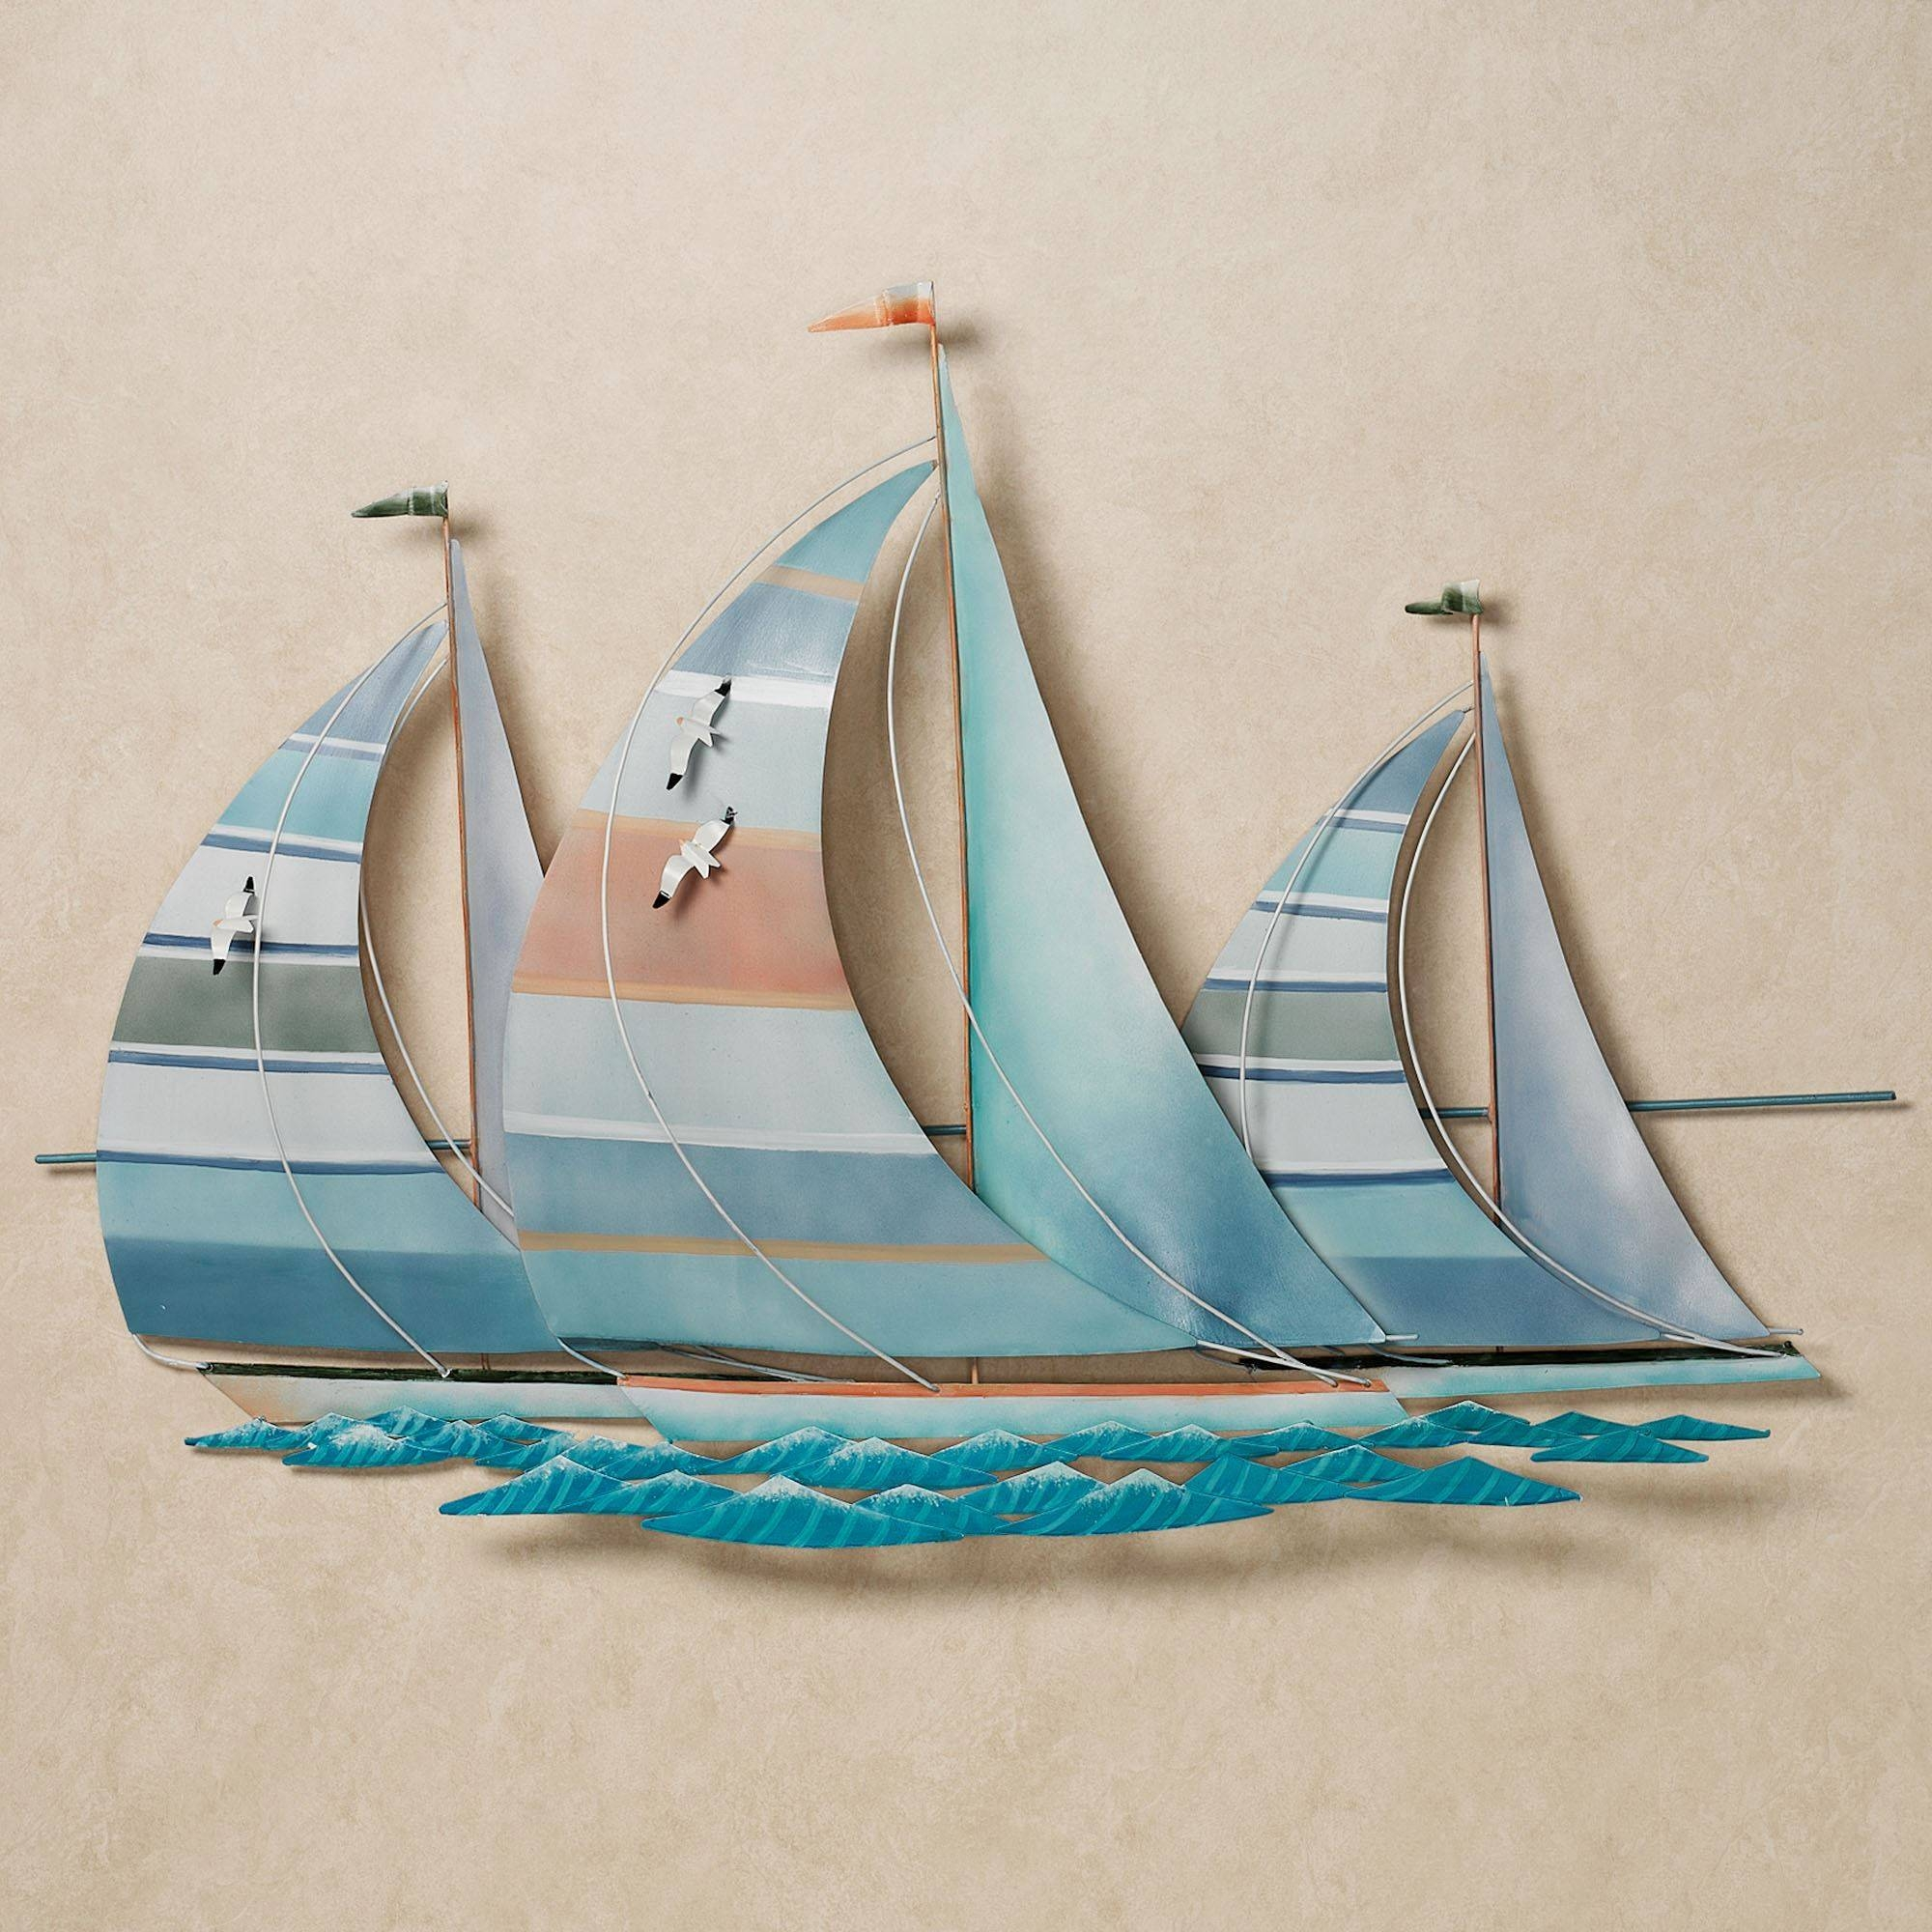 Regatta Finish Line Multi Cool Metal Sailboat Wall Sculpture For Latest Sailboat Metal Wall Art (View 18 of 30)